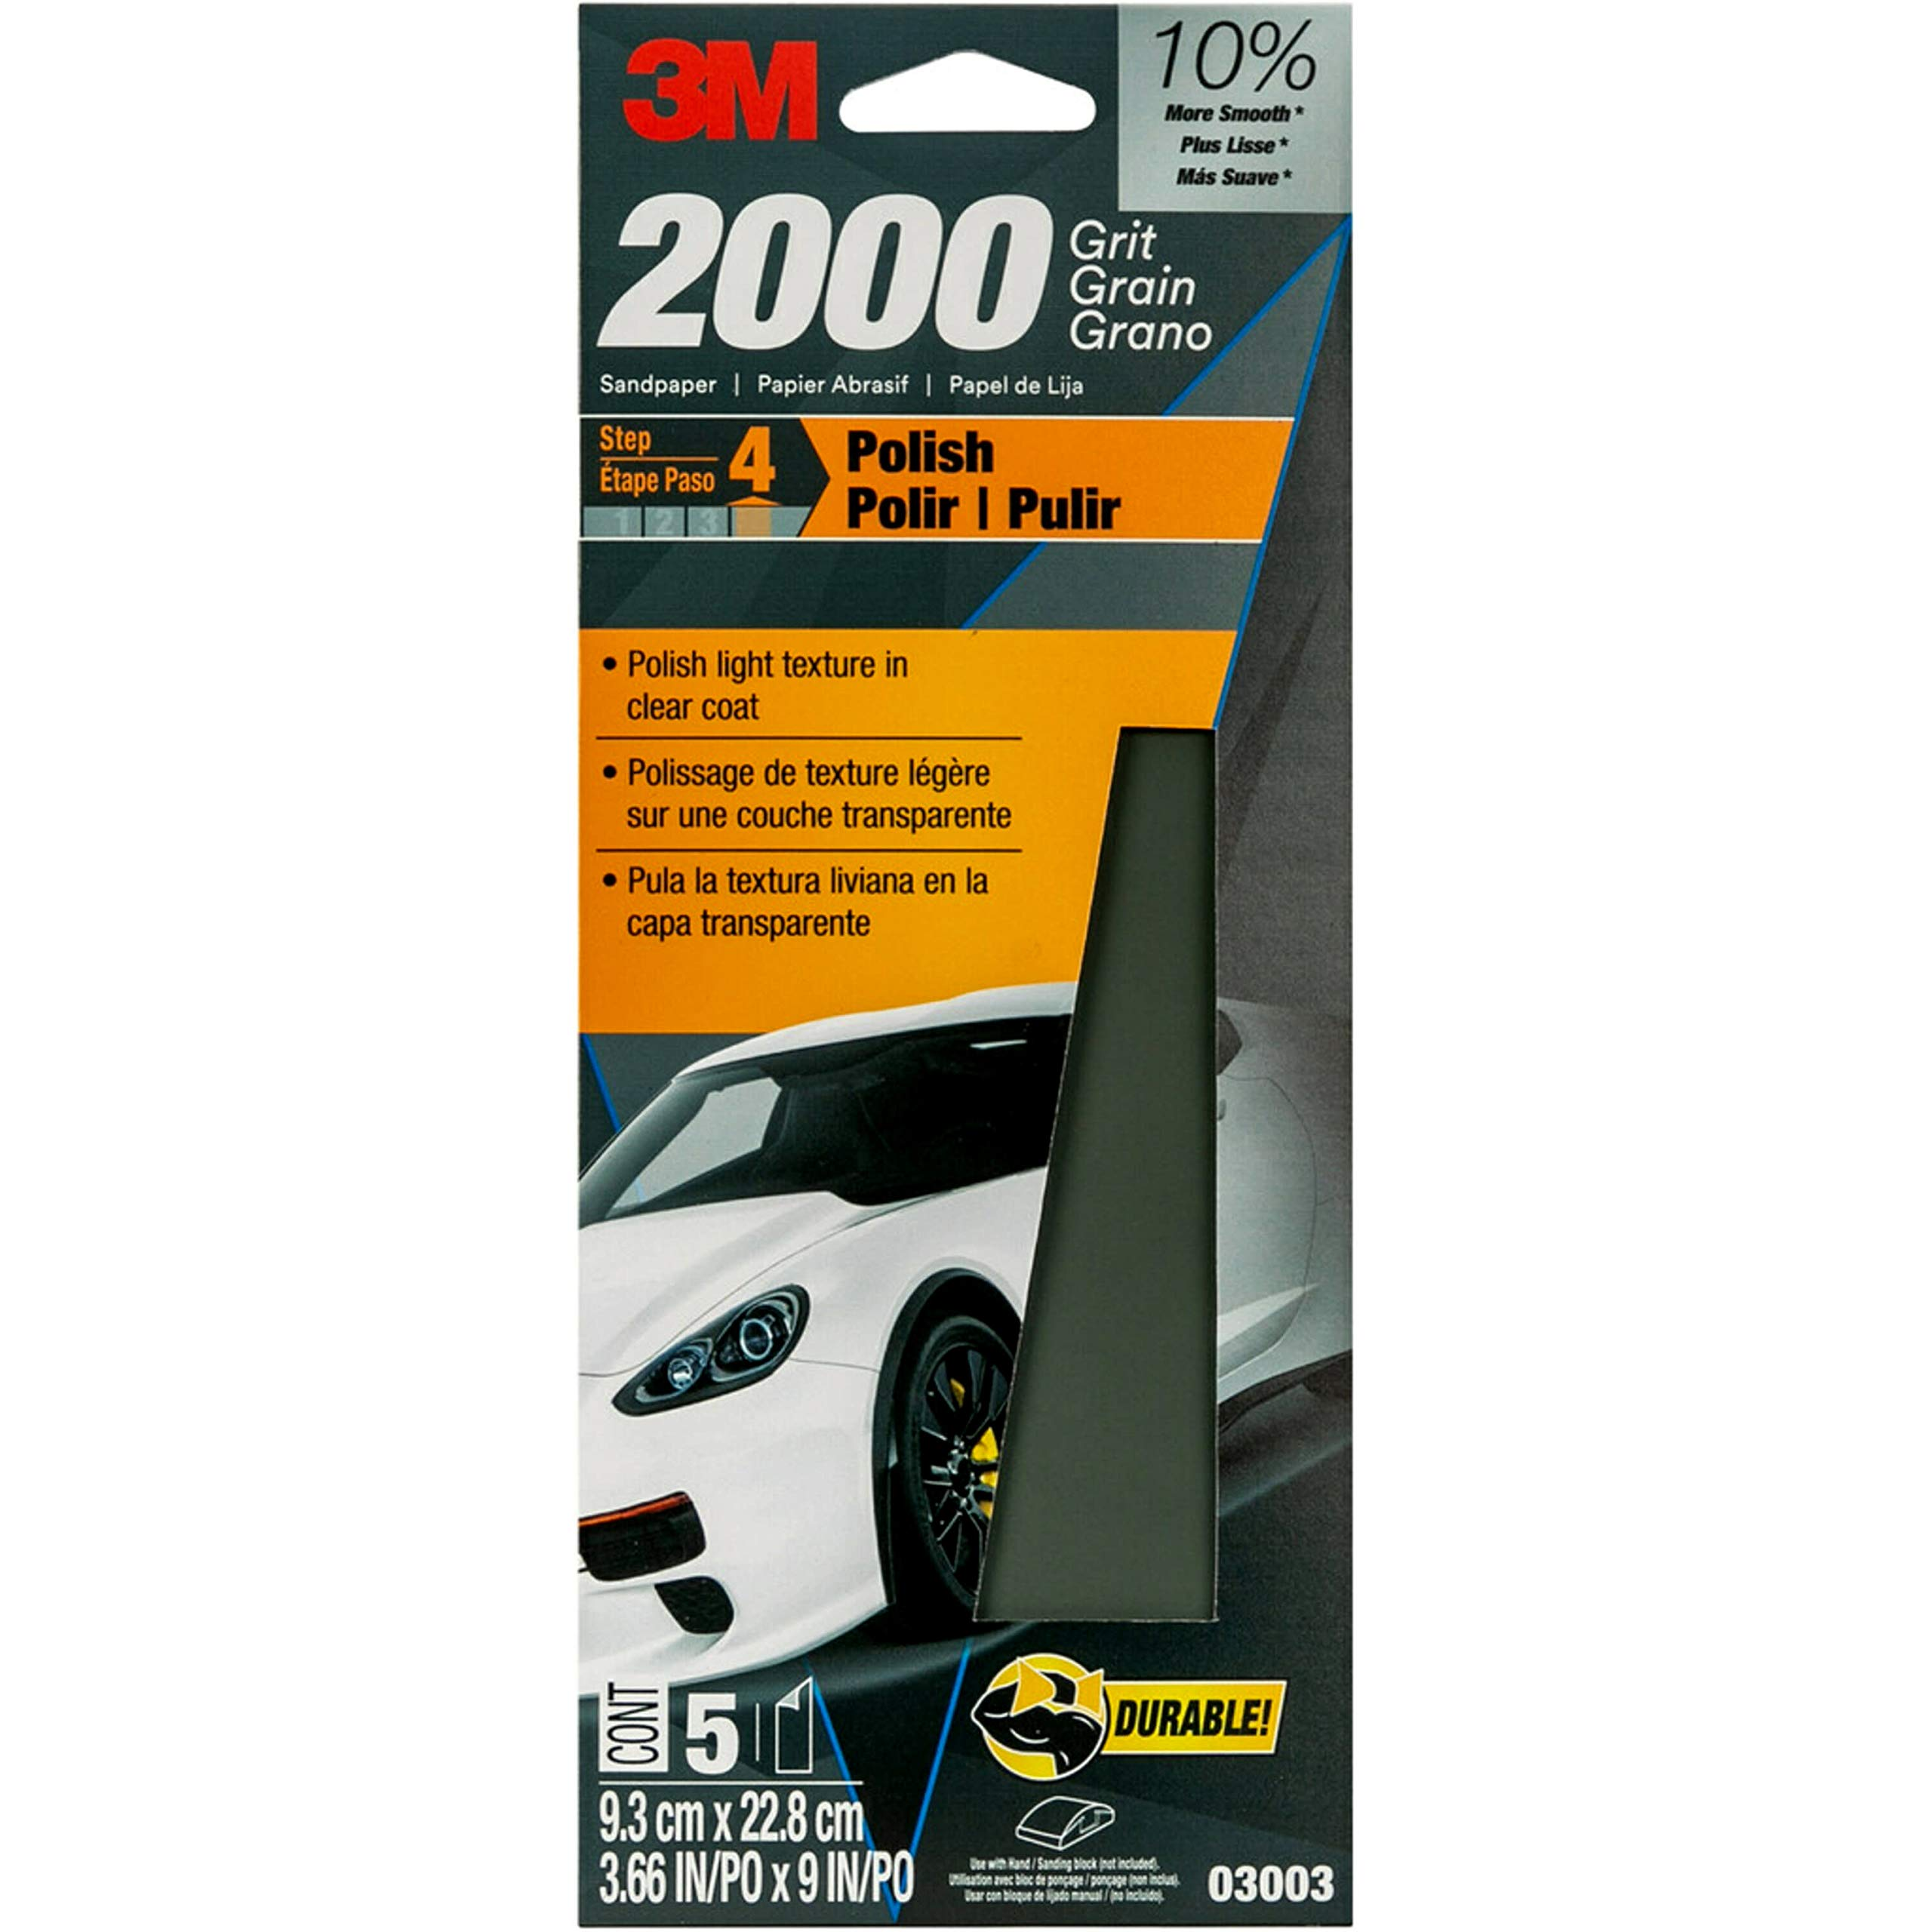 5 Lijas 3M Auto 9.3cm x 23cm Grano 2000